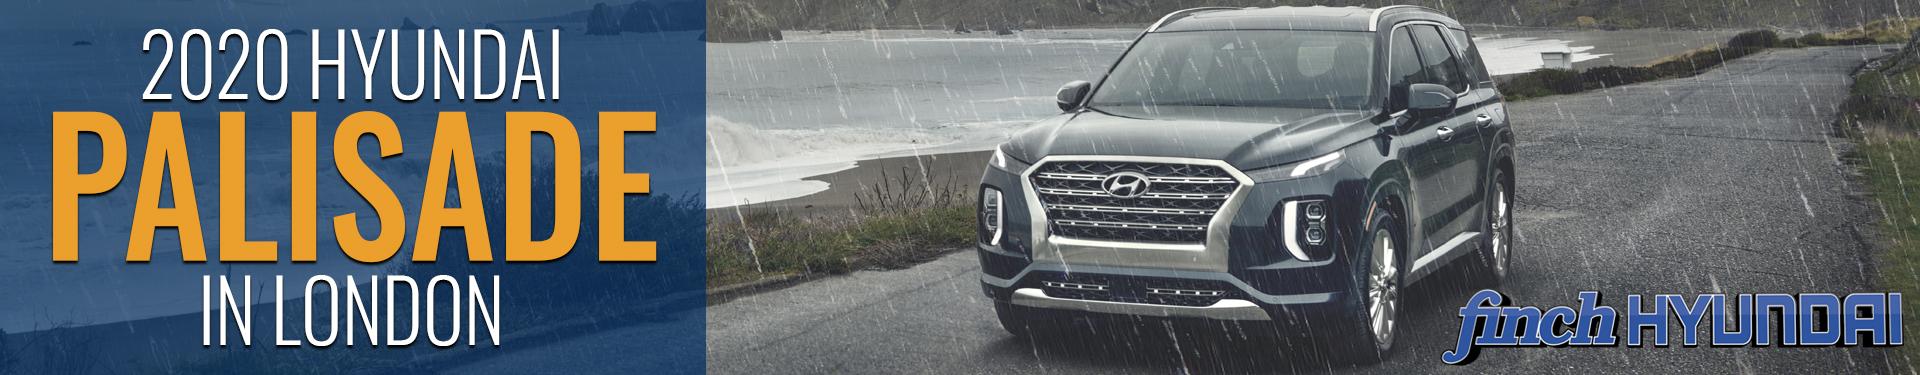 Discover the new 2020 Hyundai Palisade in London Ontario, Sarnia, Stratford & Woodstock from Finch Hyundai, new SUV in London